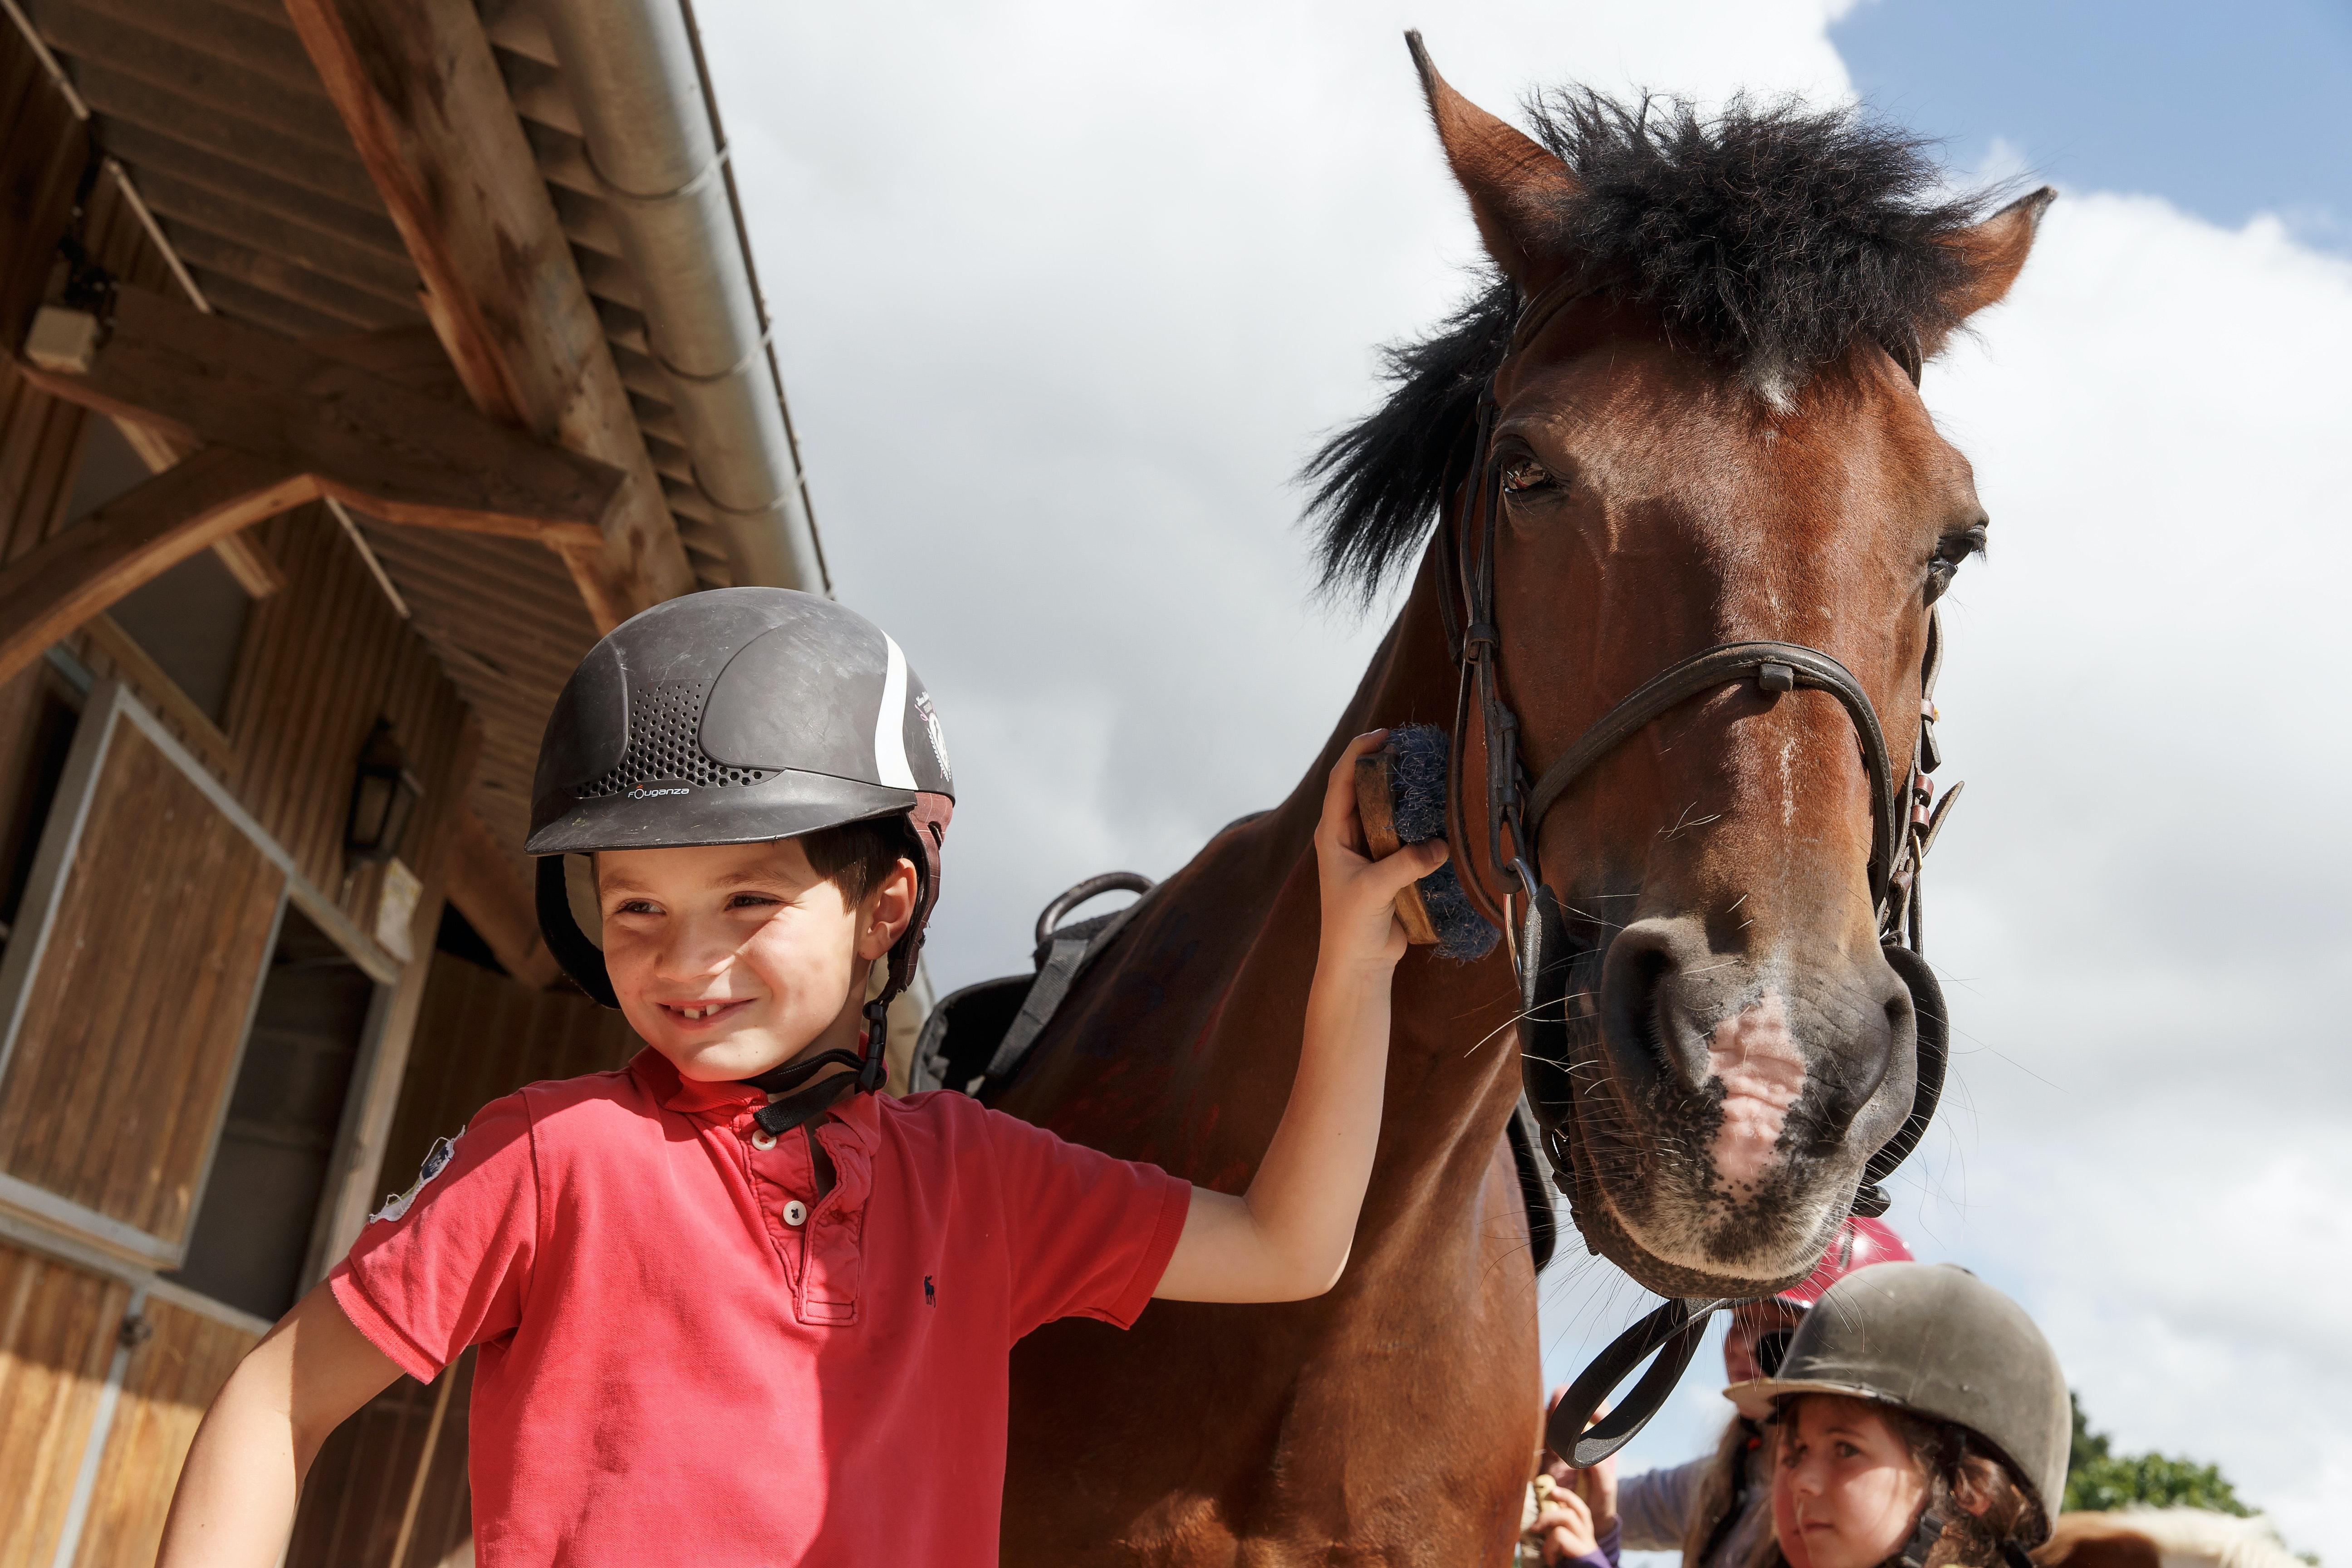 Camping Domaine des Ormes kind met paard